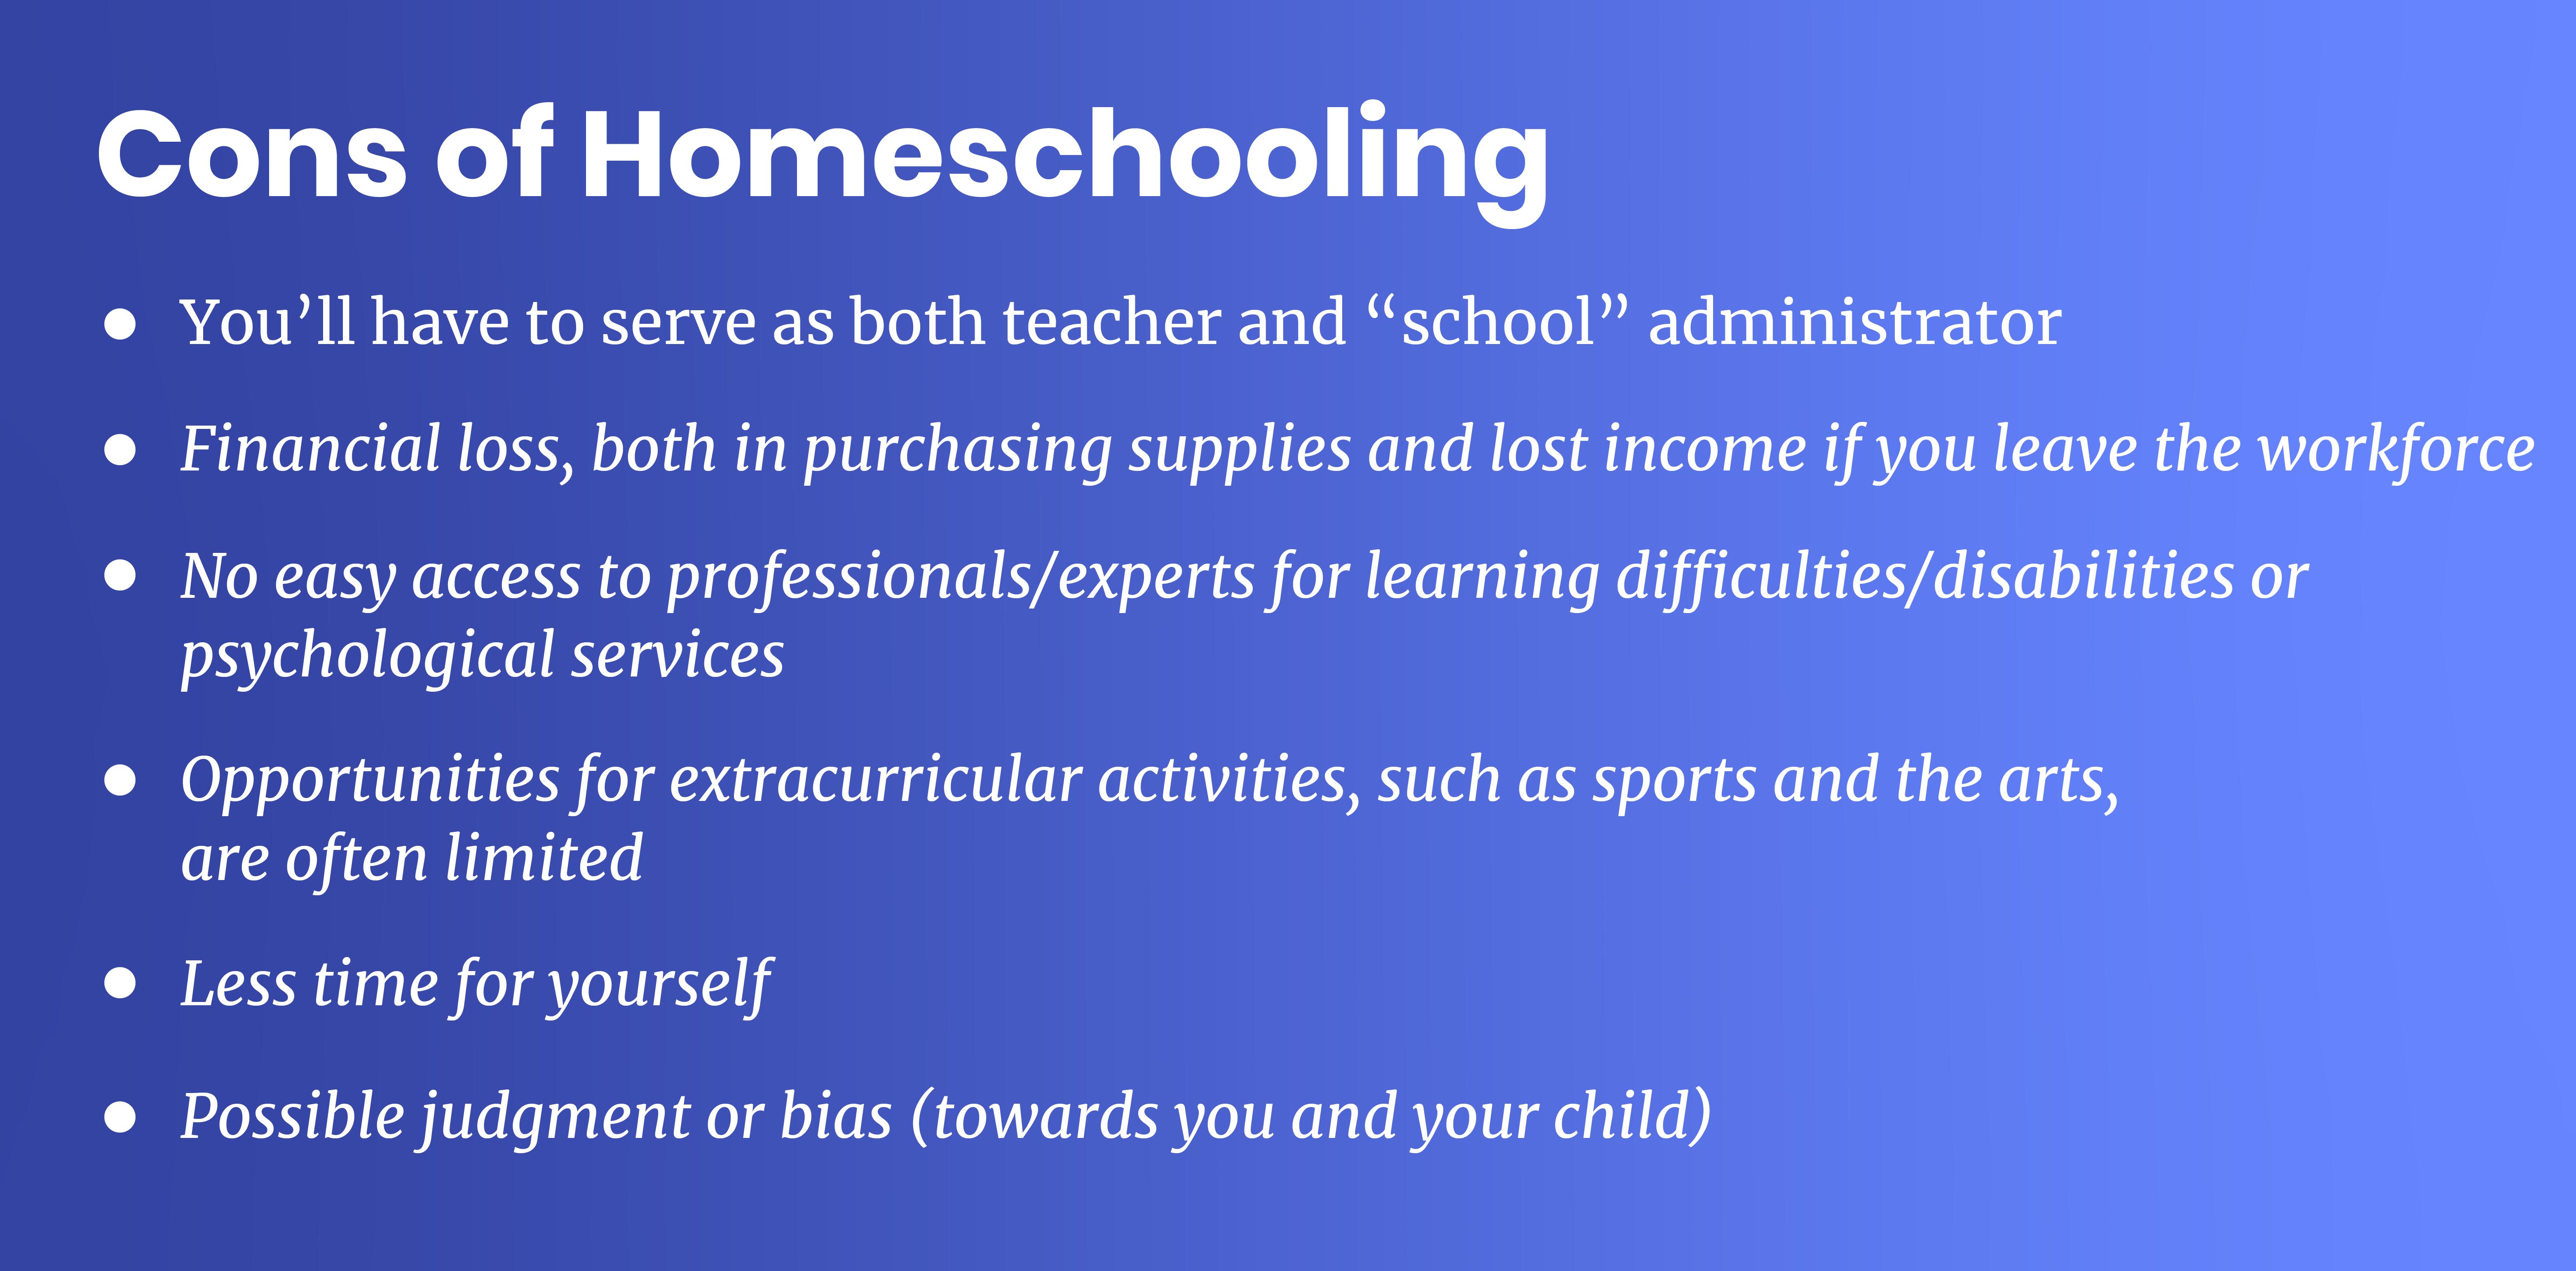 homeschooling cons